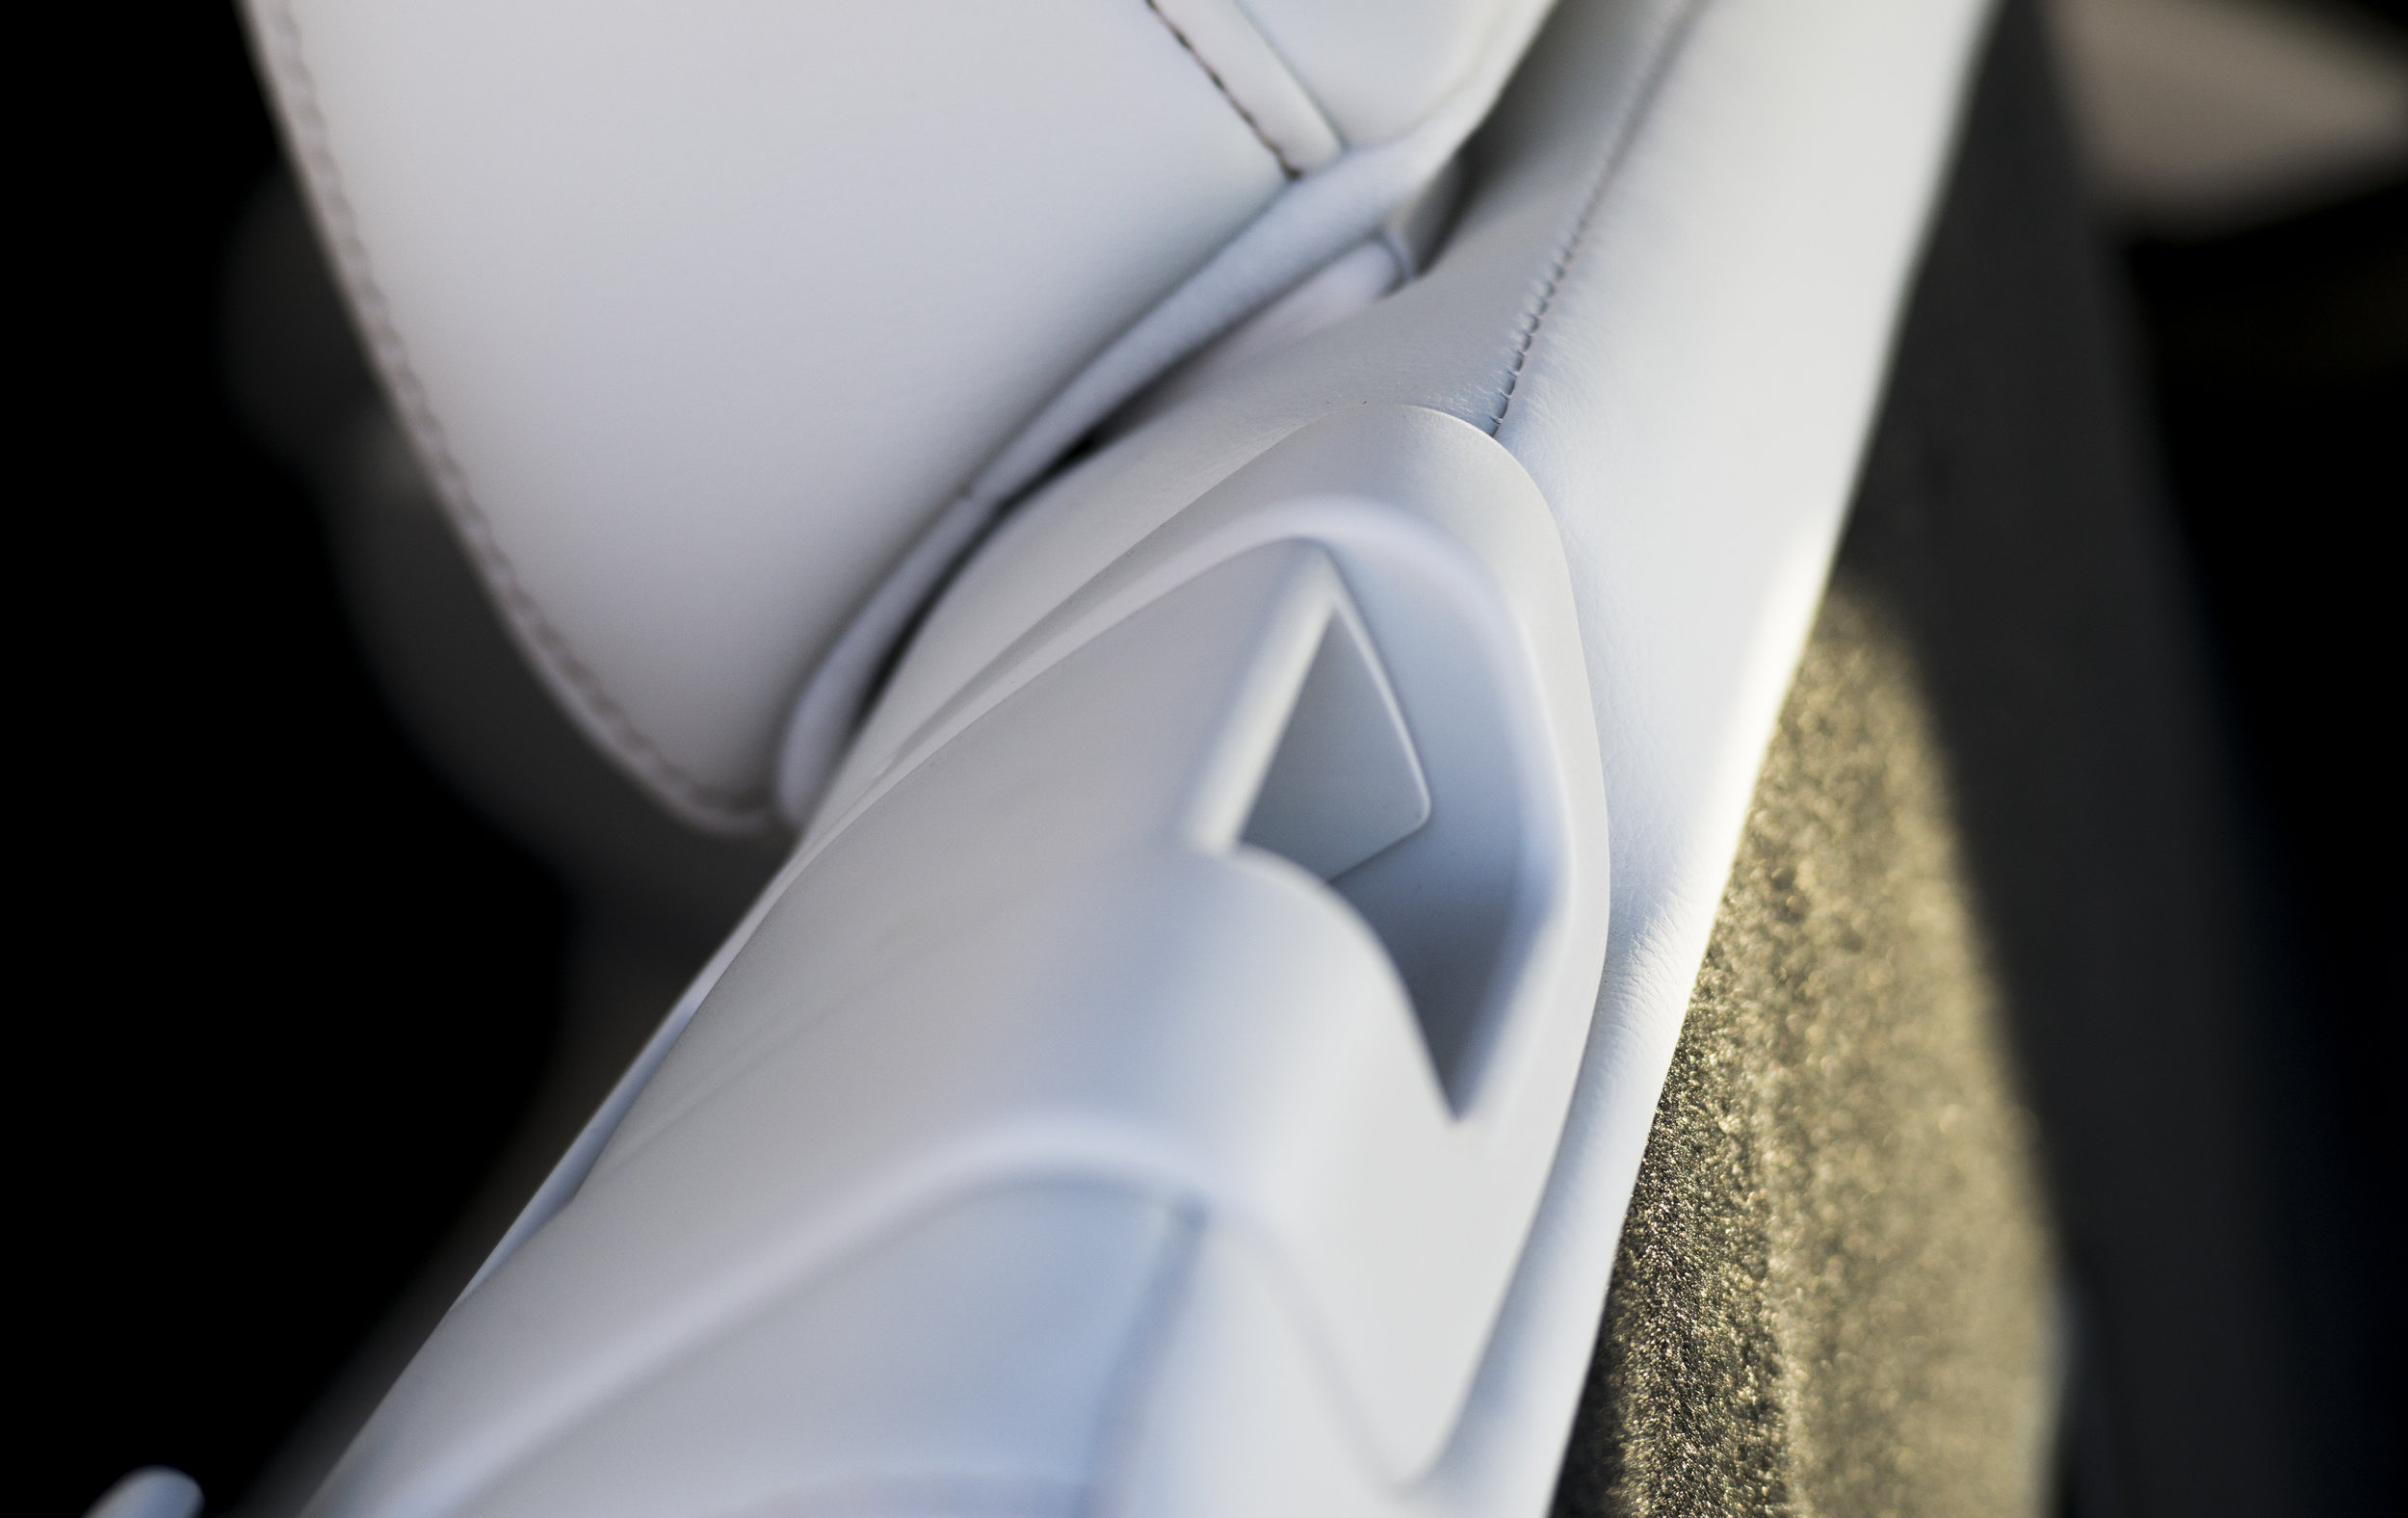 cx5.interior.1006.jpg